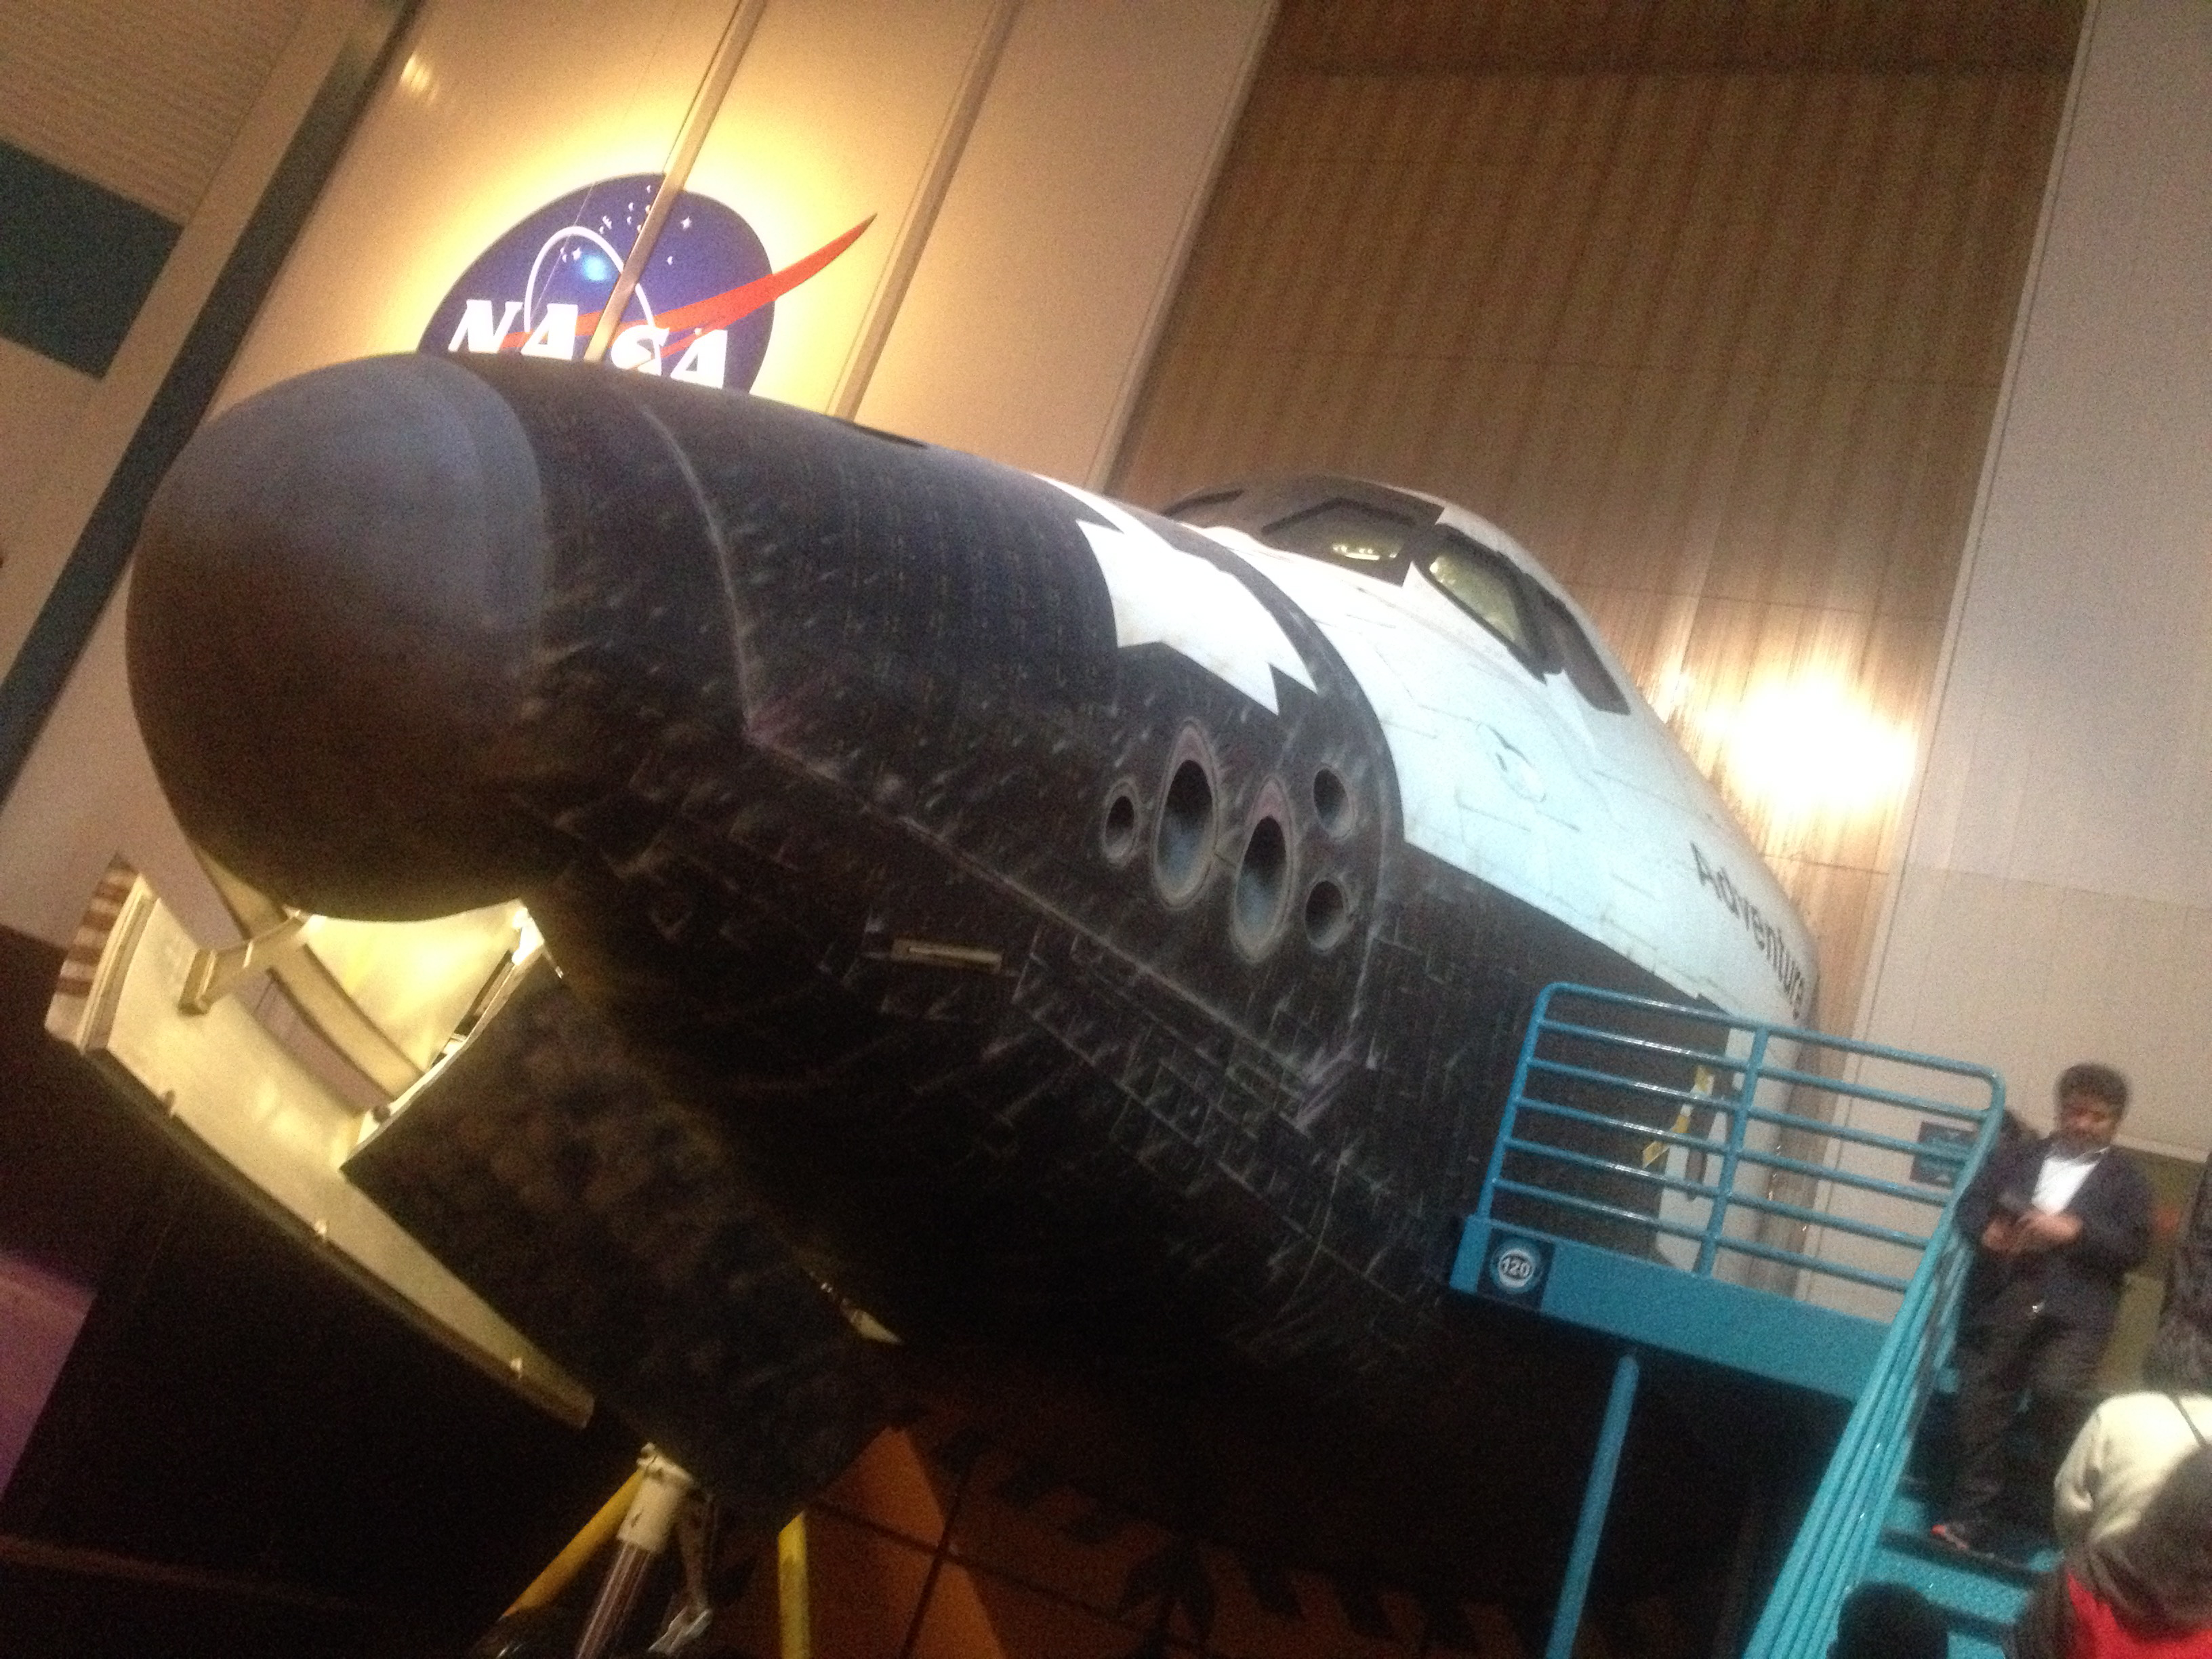 Shuttle Adventure at NASA JSC